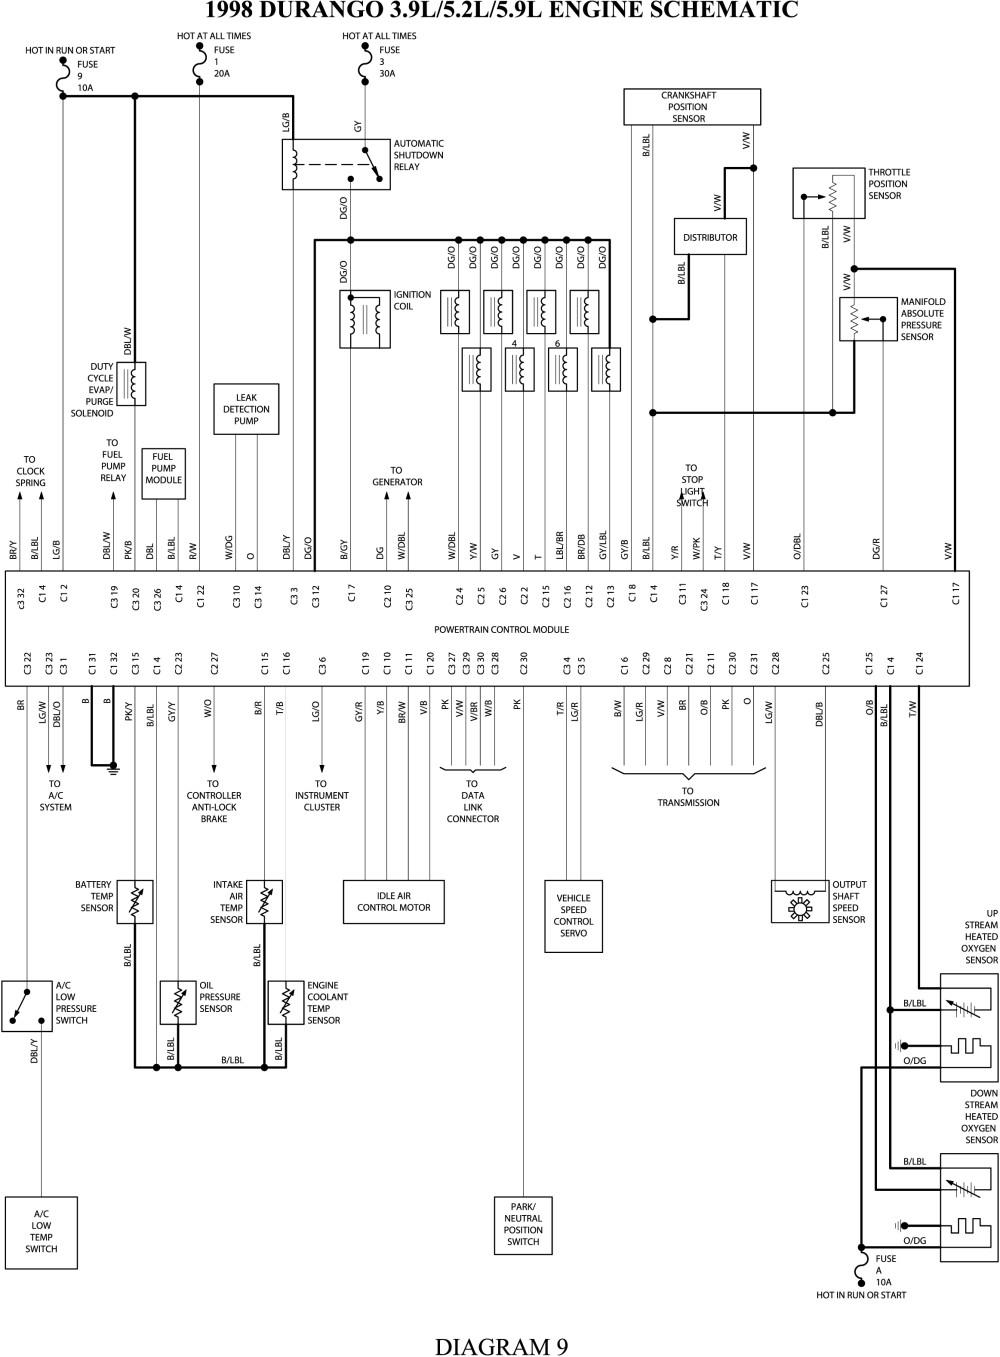 2002 dodge dakota wiring diagram Download-99 dodge durango wiring diagram Collection 1997 dodge dakota distributor wiring diagram wiring data rh 4-c